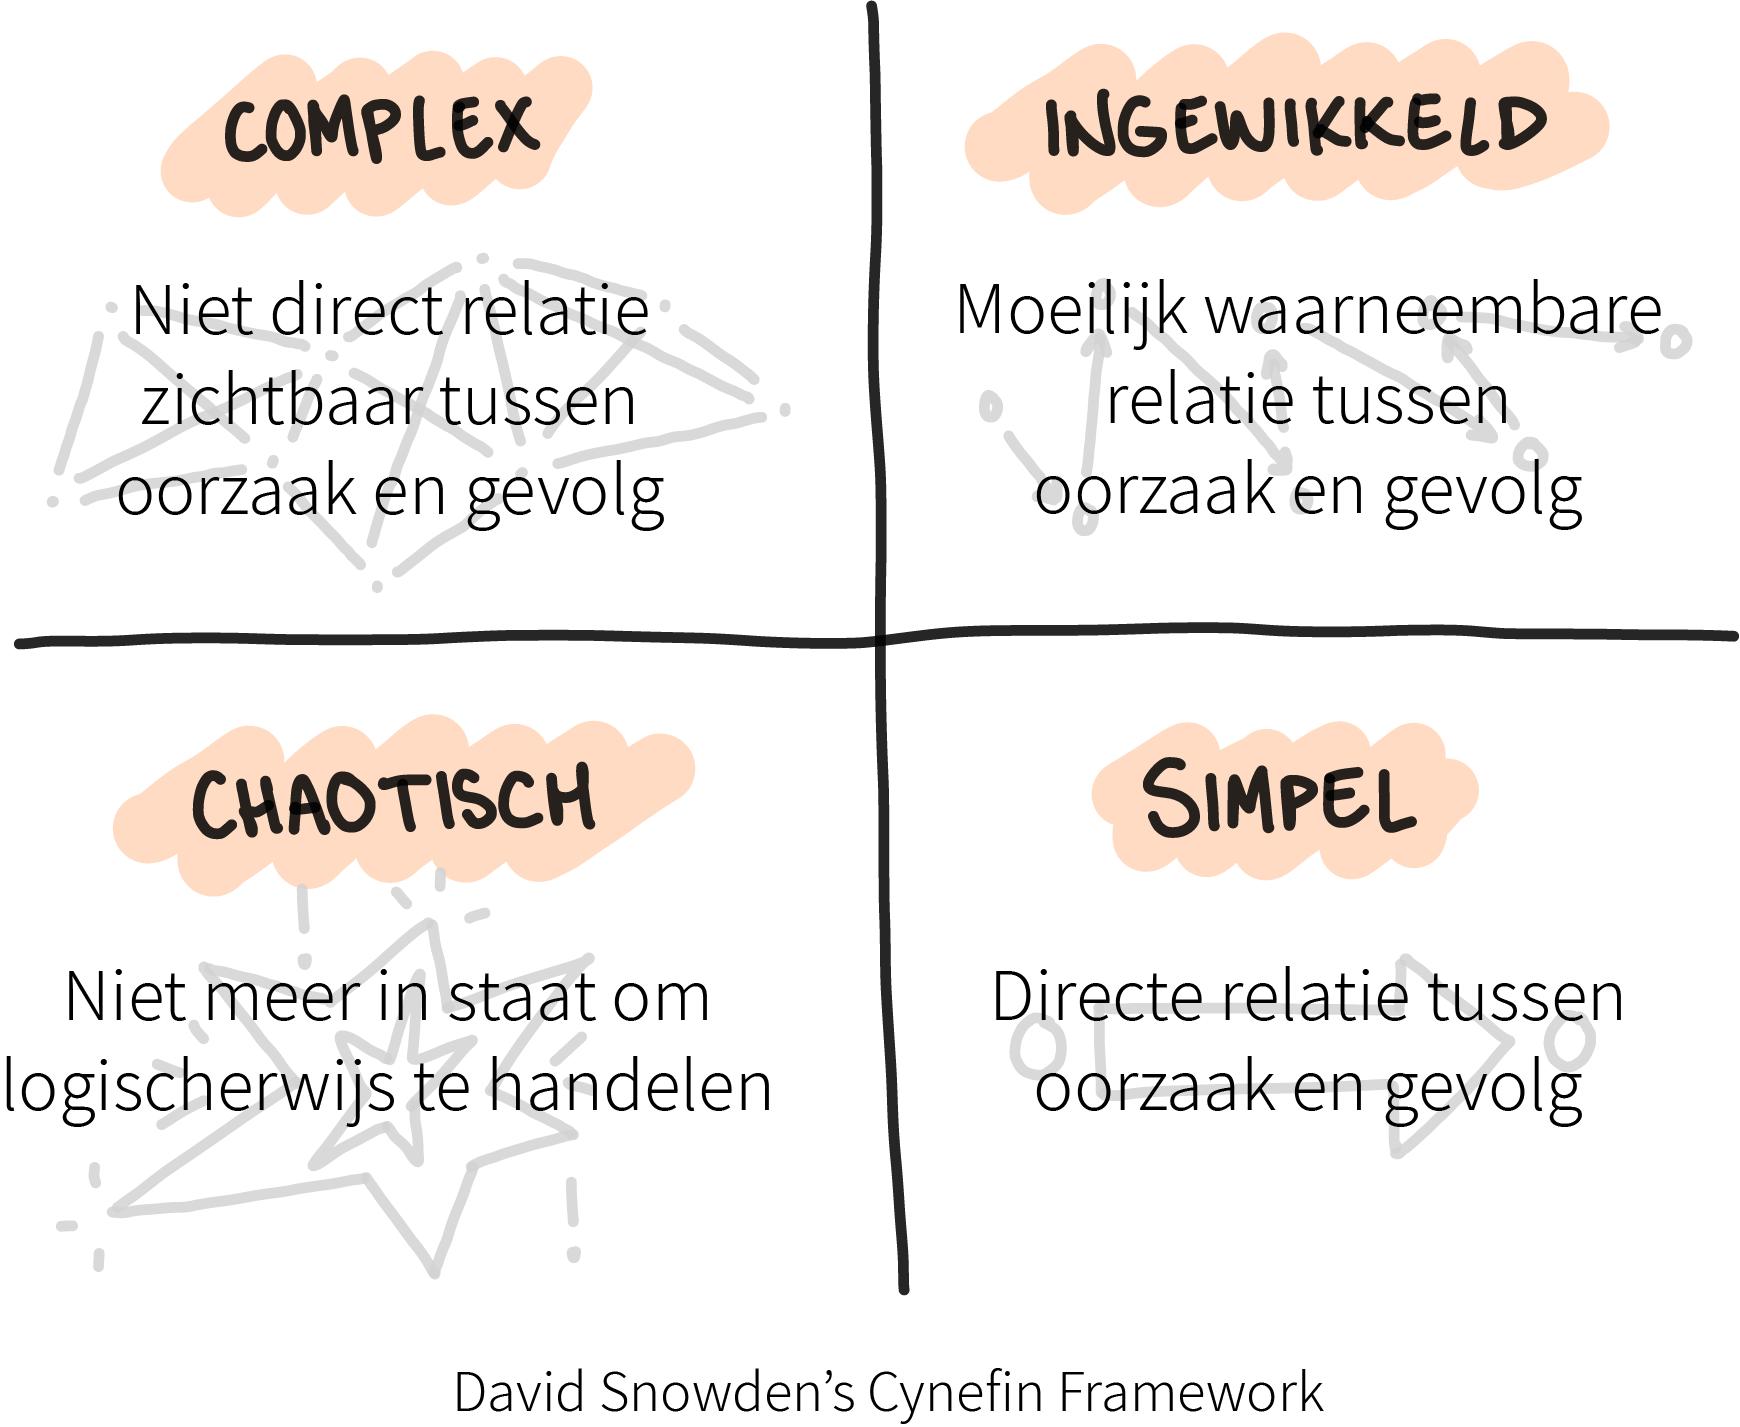 Het Cynefin Framework van Snowden